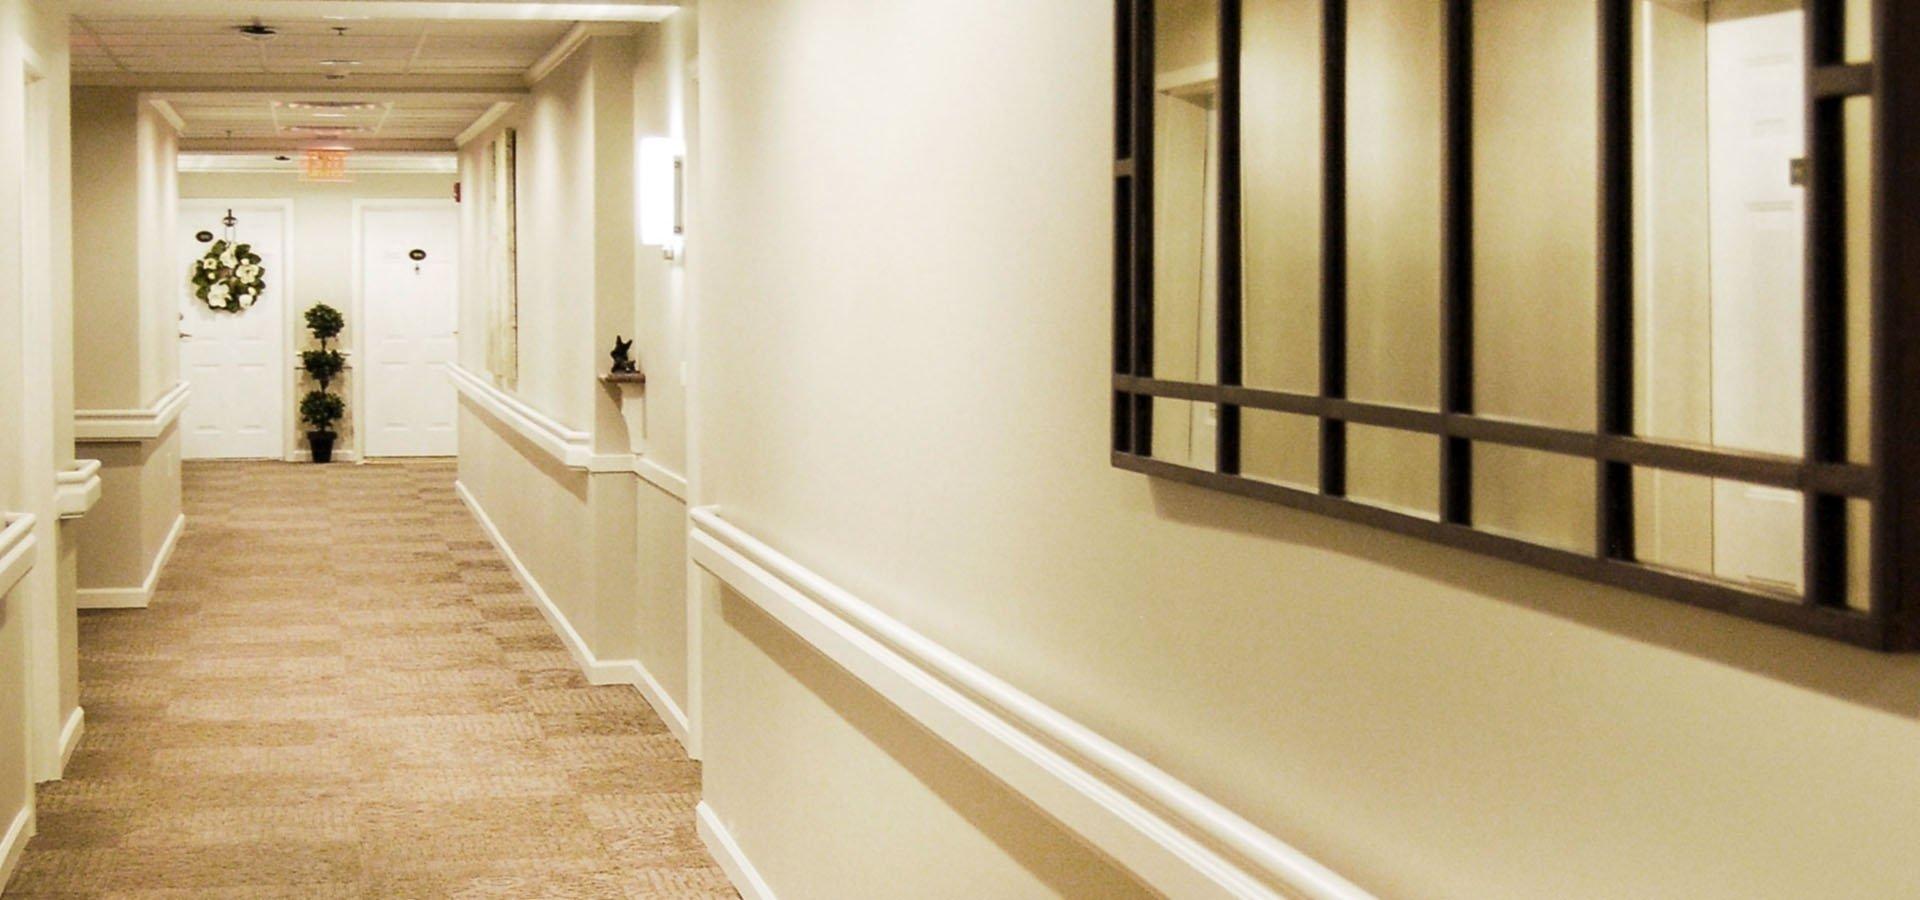 Magnolia Trace | Hallway Renovation | Brindley Construction